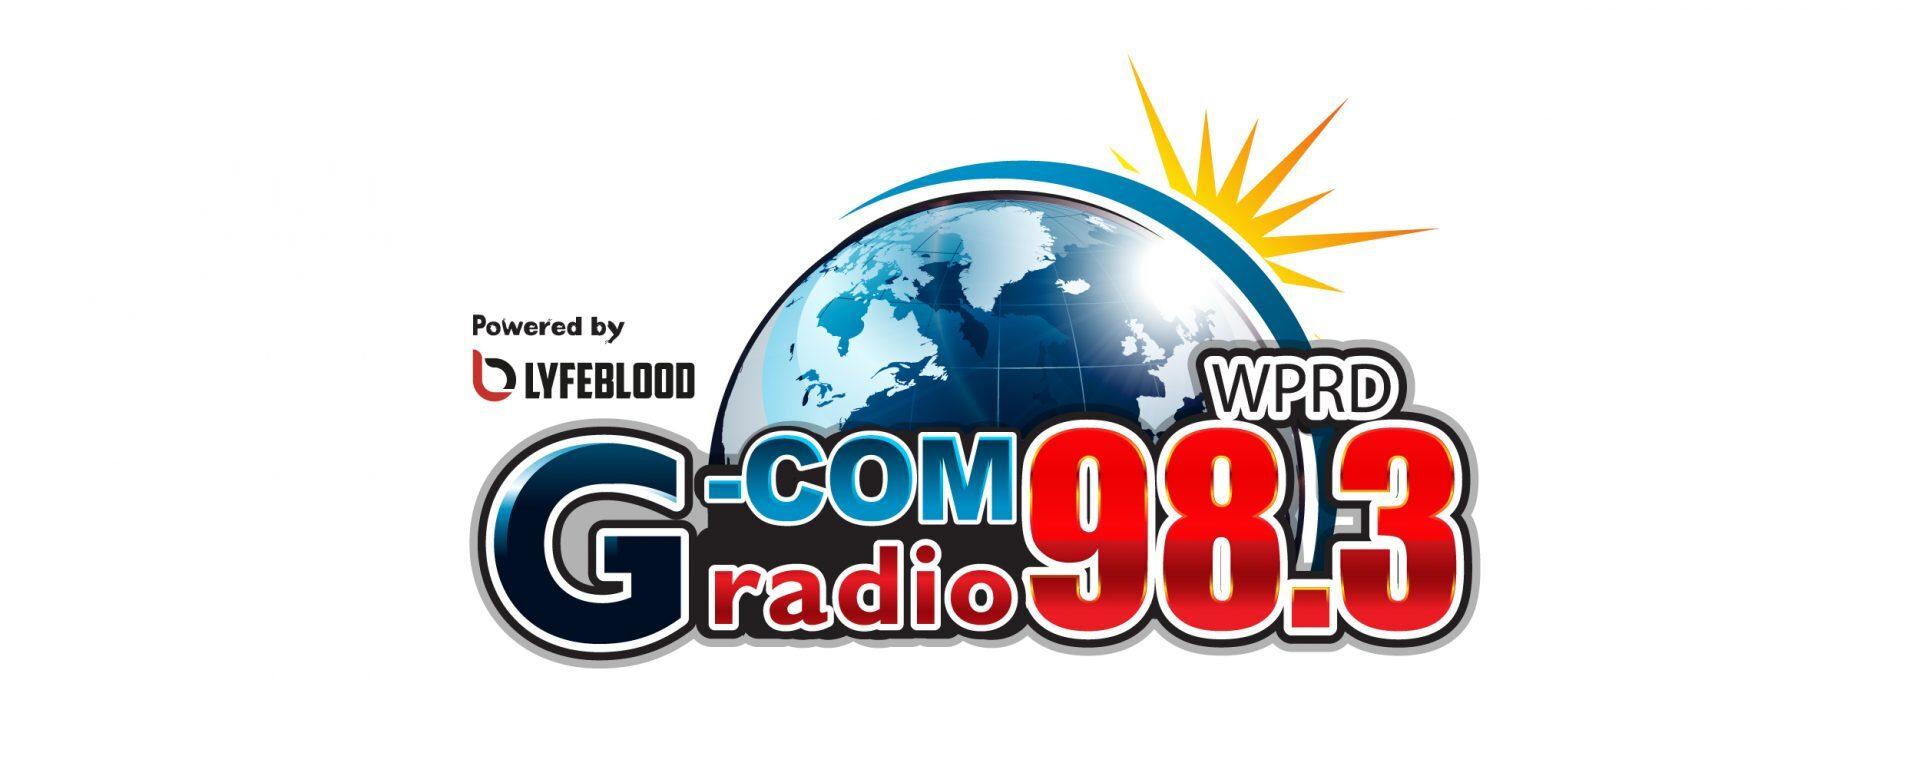 WPRD 98.3 G-COM Radio Ep. 10 – 10th Episode *Special* Emerging Artist